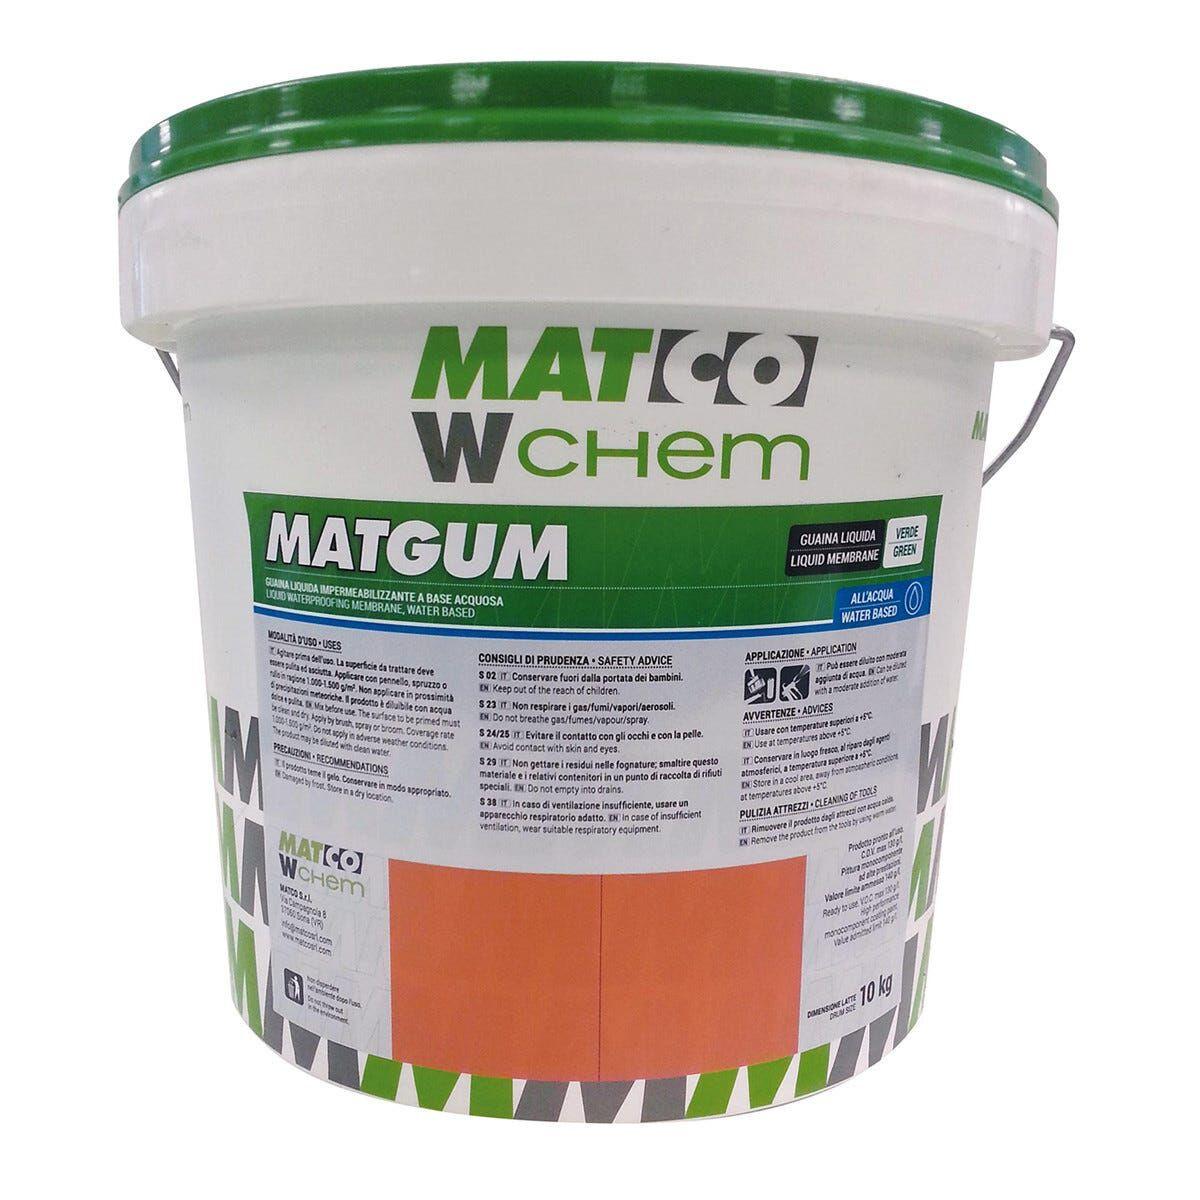 Guaina Liquida Elastomerica Verde 10 Kg Matgum